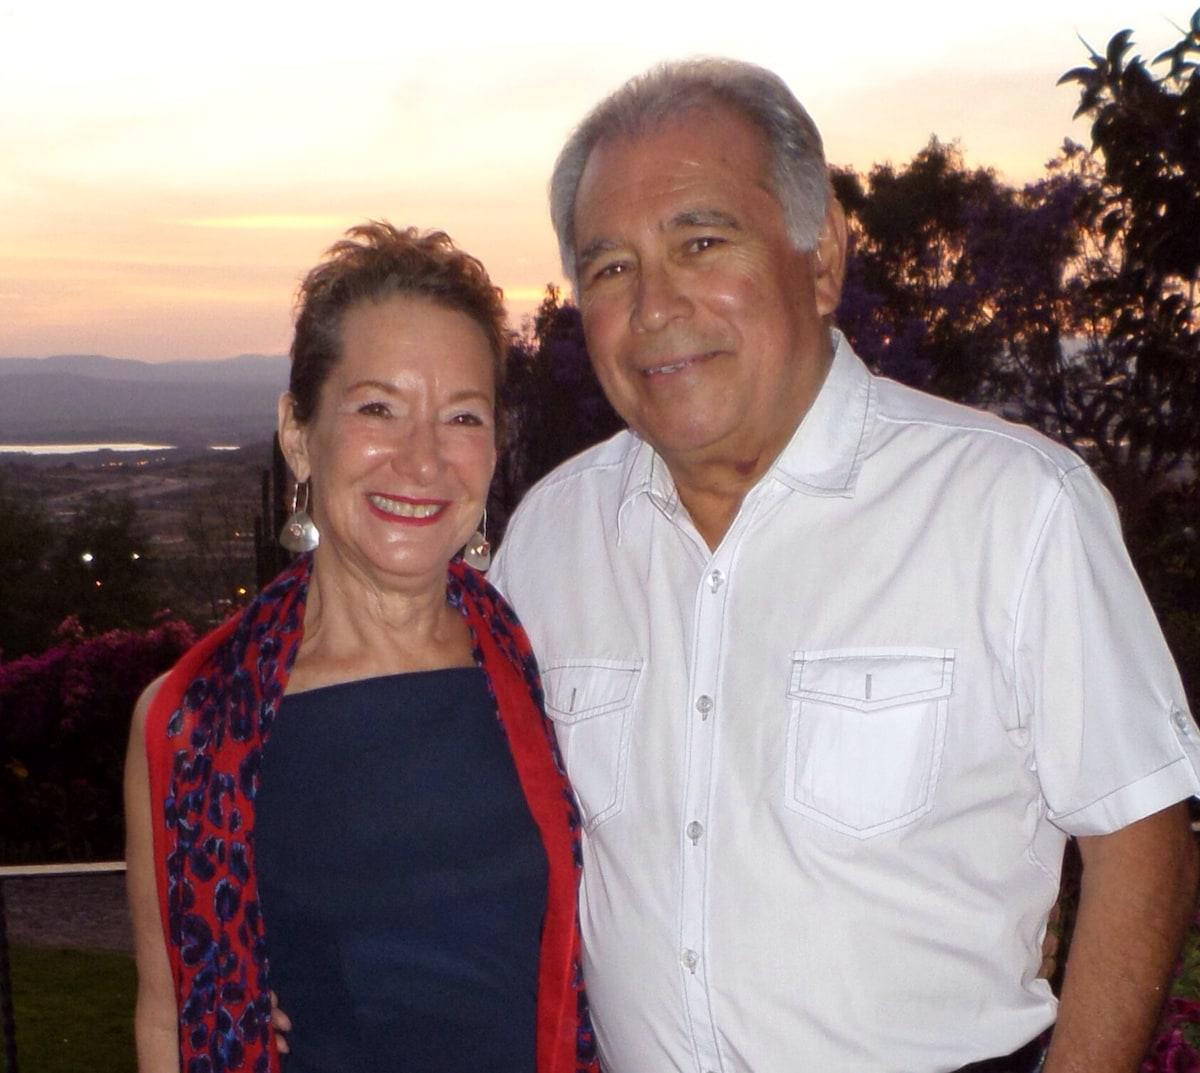 Joan from San Miguel de Allende